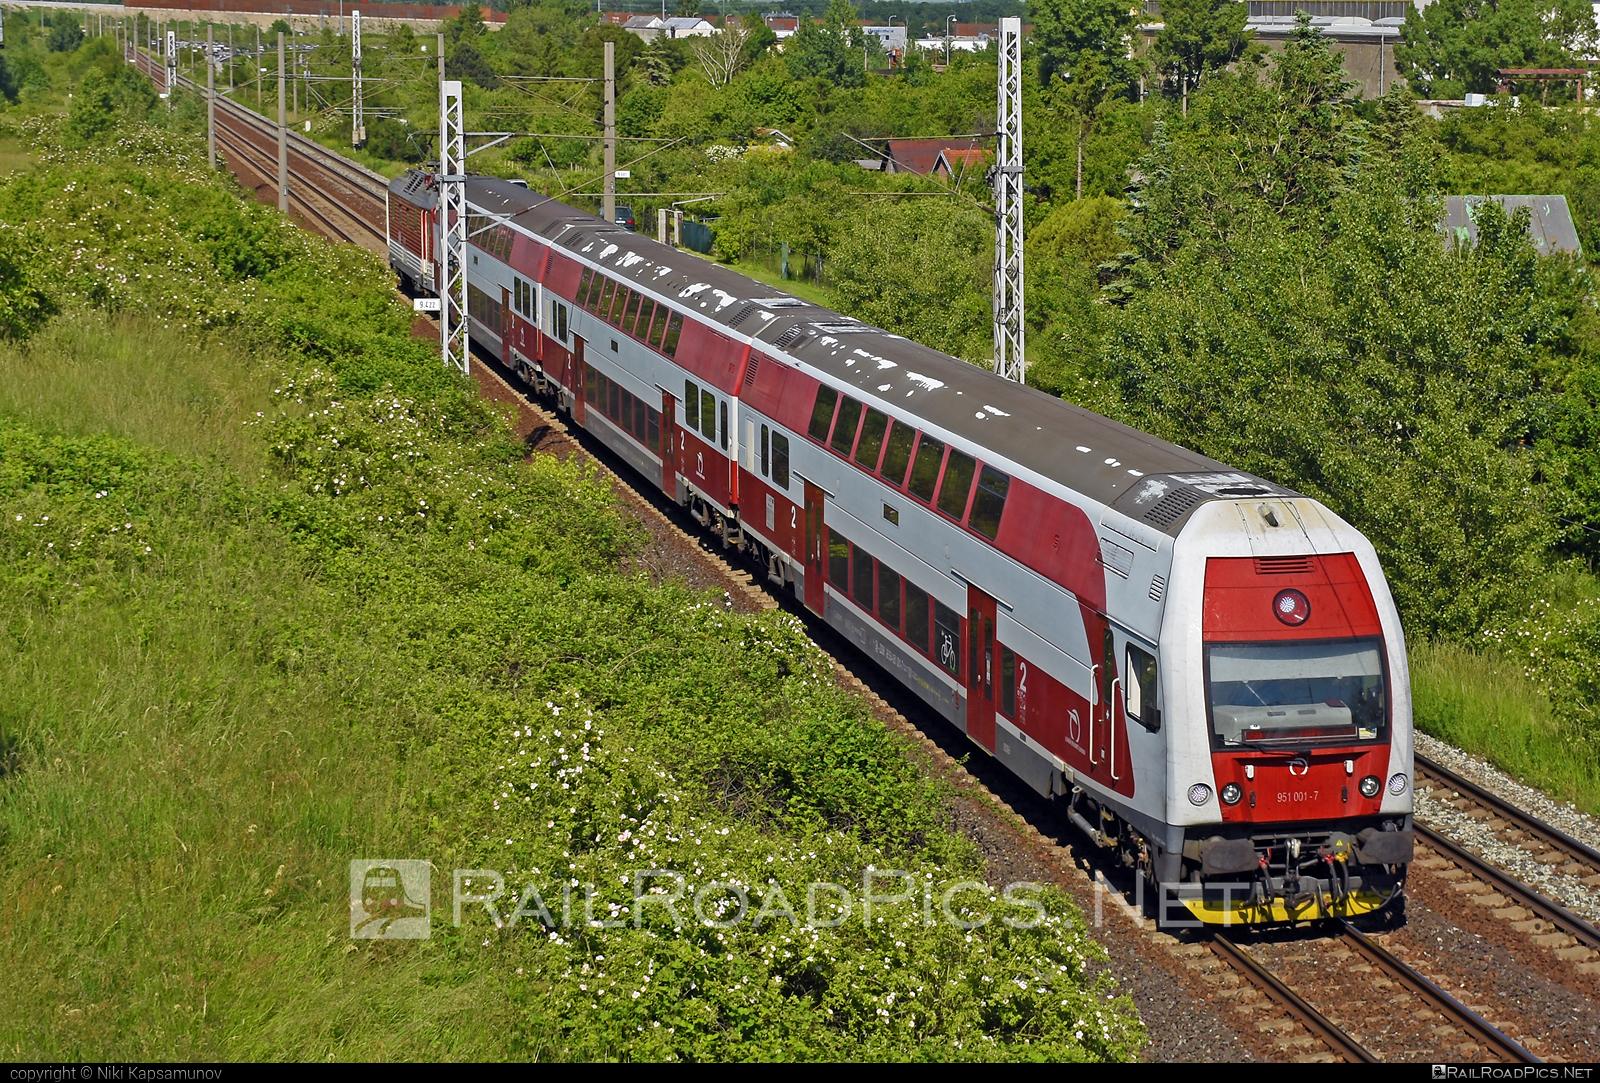 Škoda 4Ev - 951 001-7 operated by Železničná Spoločnost' Slovensko, a.s. #ZeleznicnaSpolocnostSlovensko #emu671 #janosik #skoda #skoda4ev #skodaclass671 #zssk